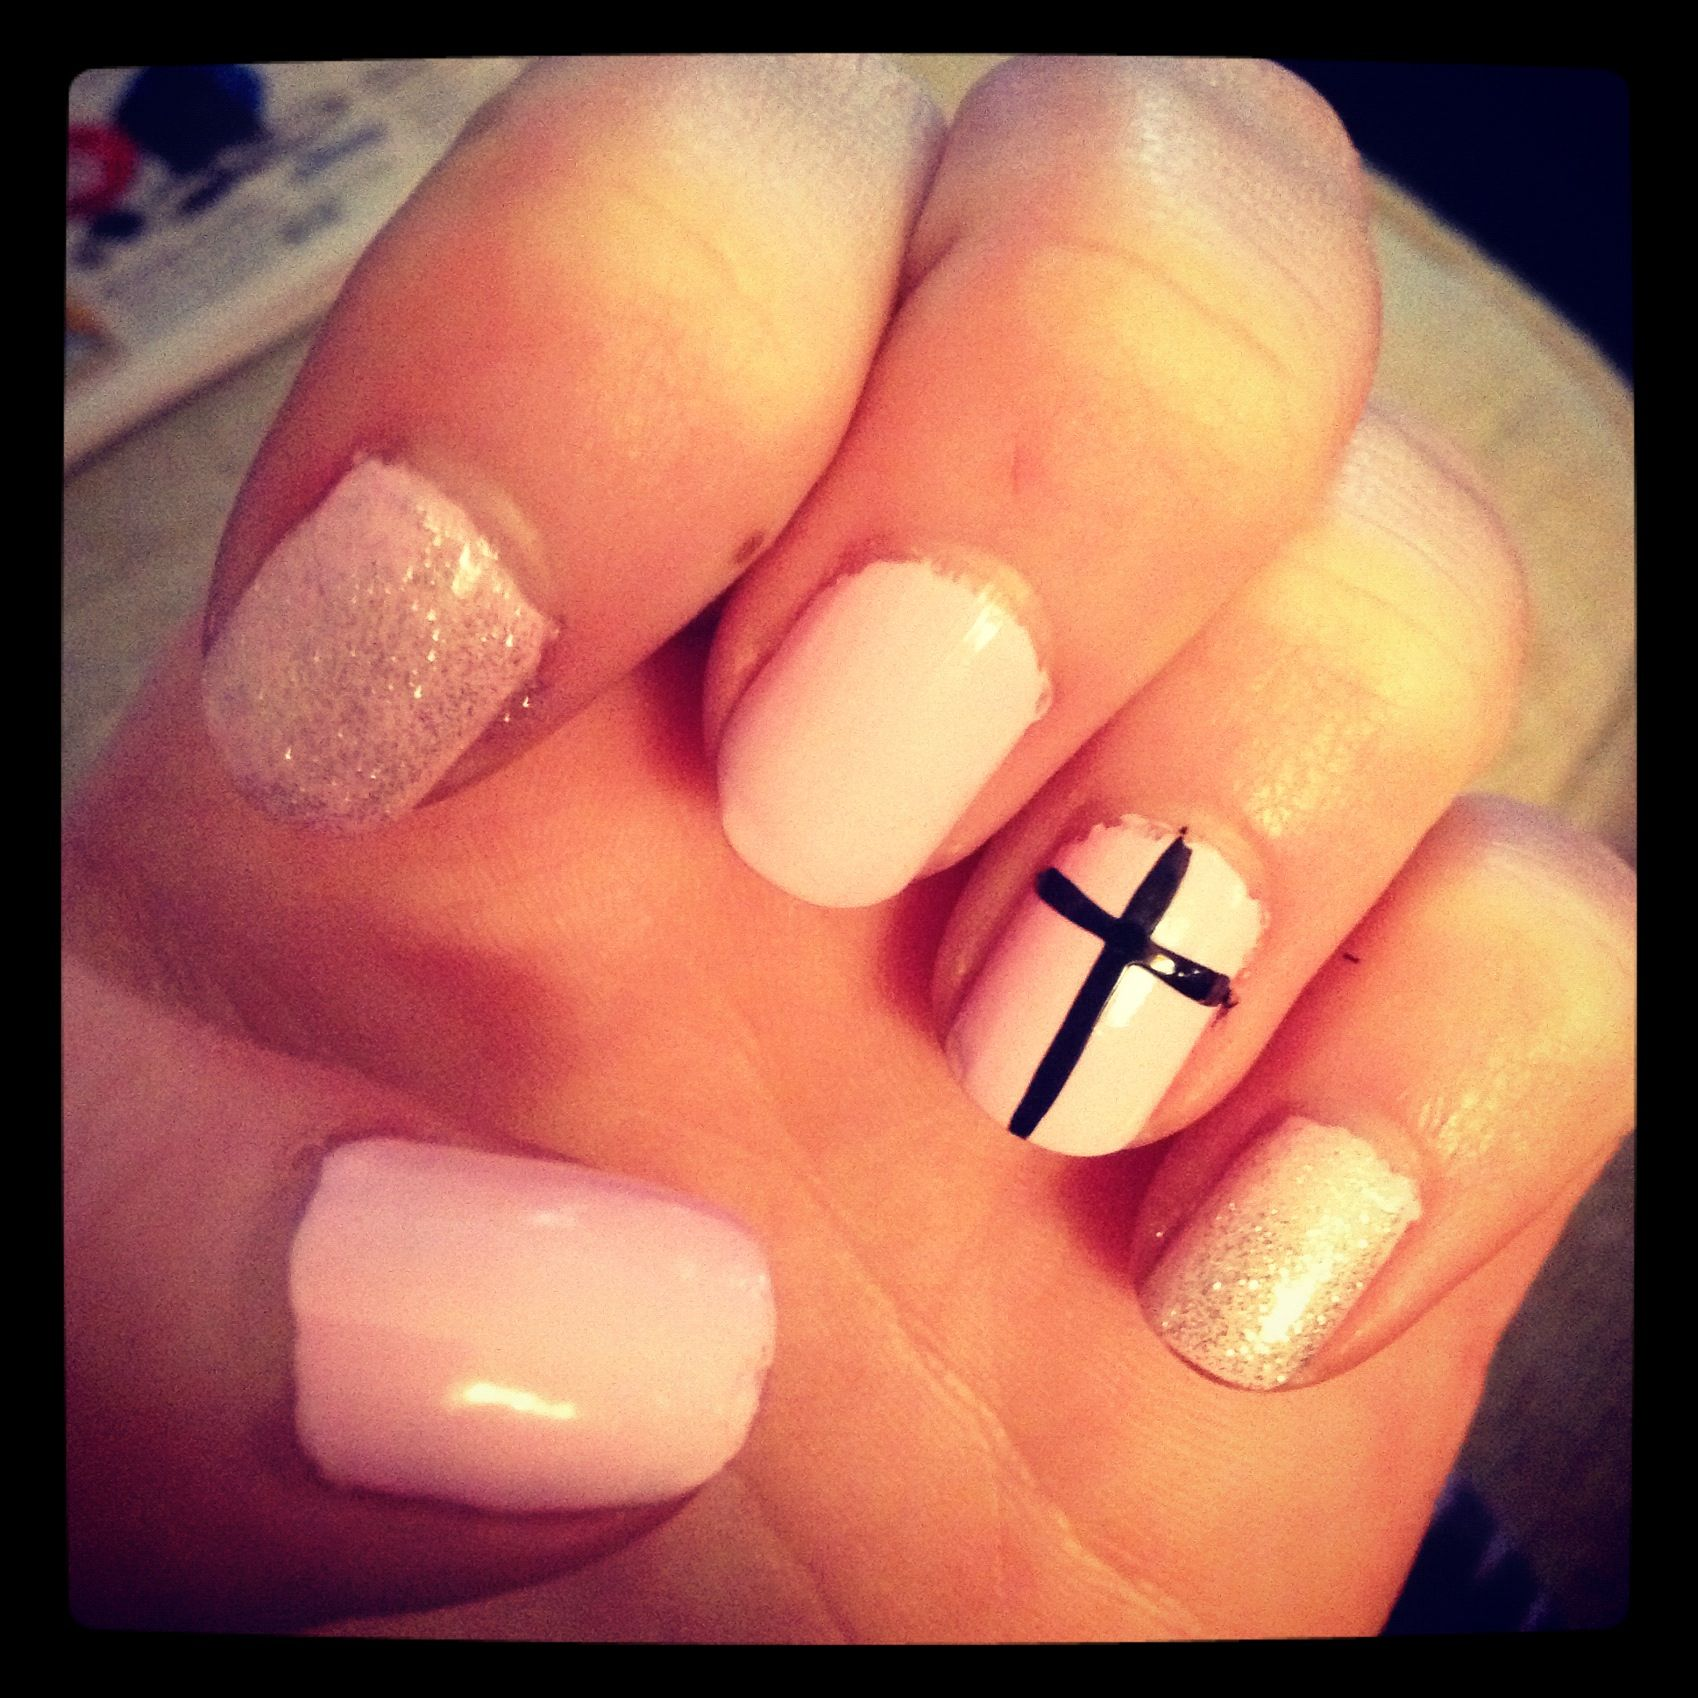 Cross nails!